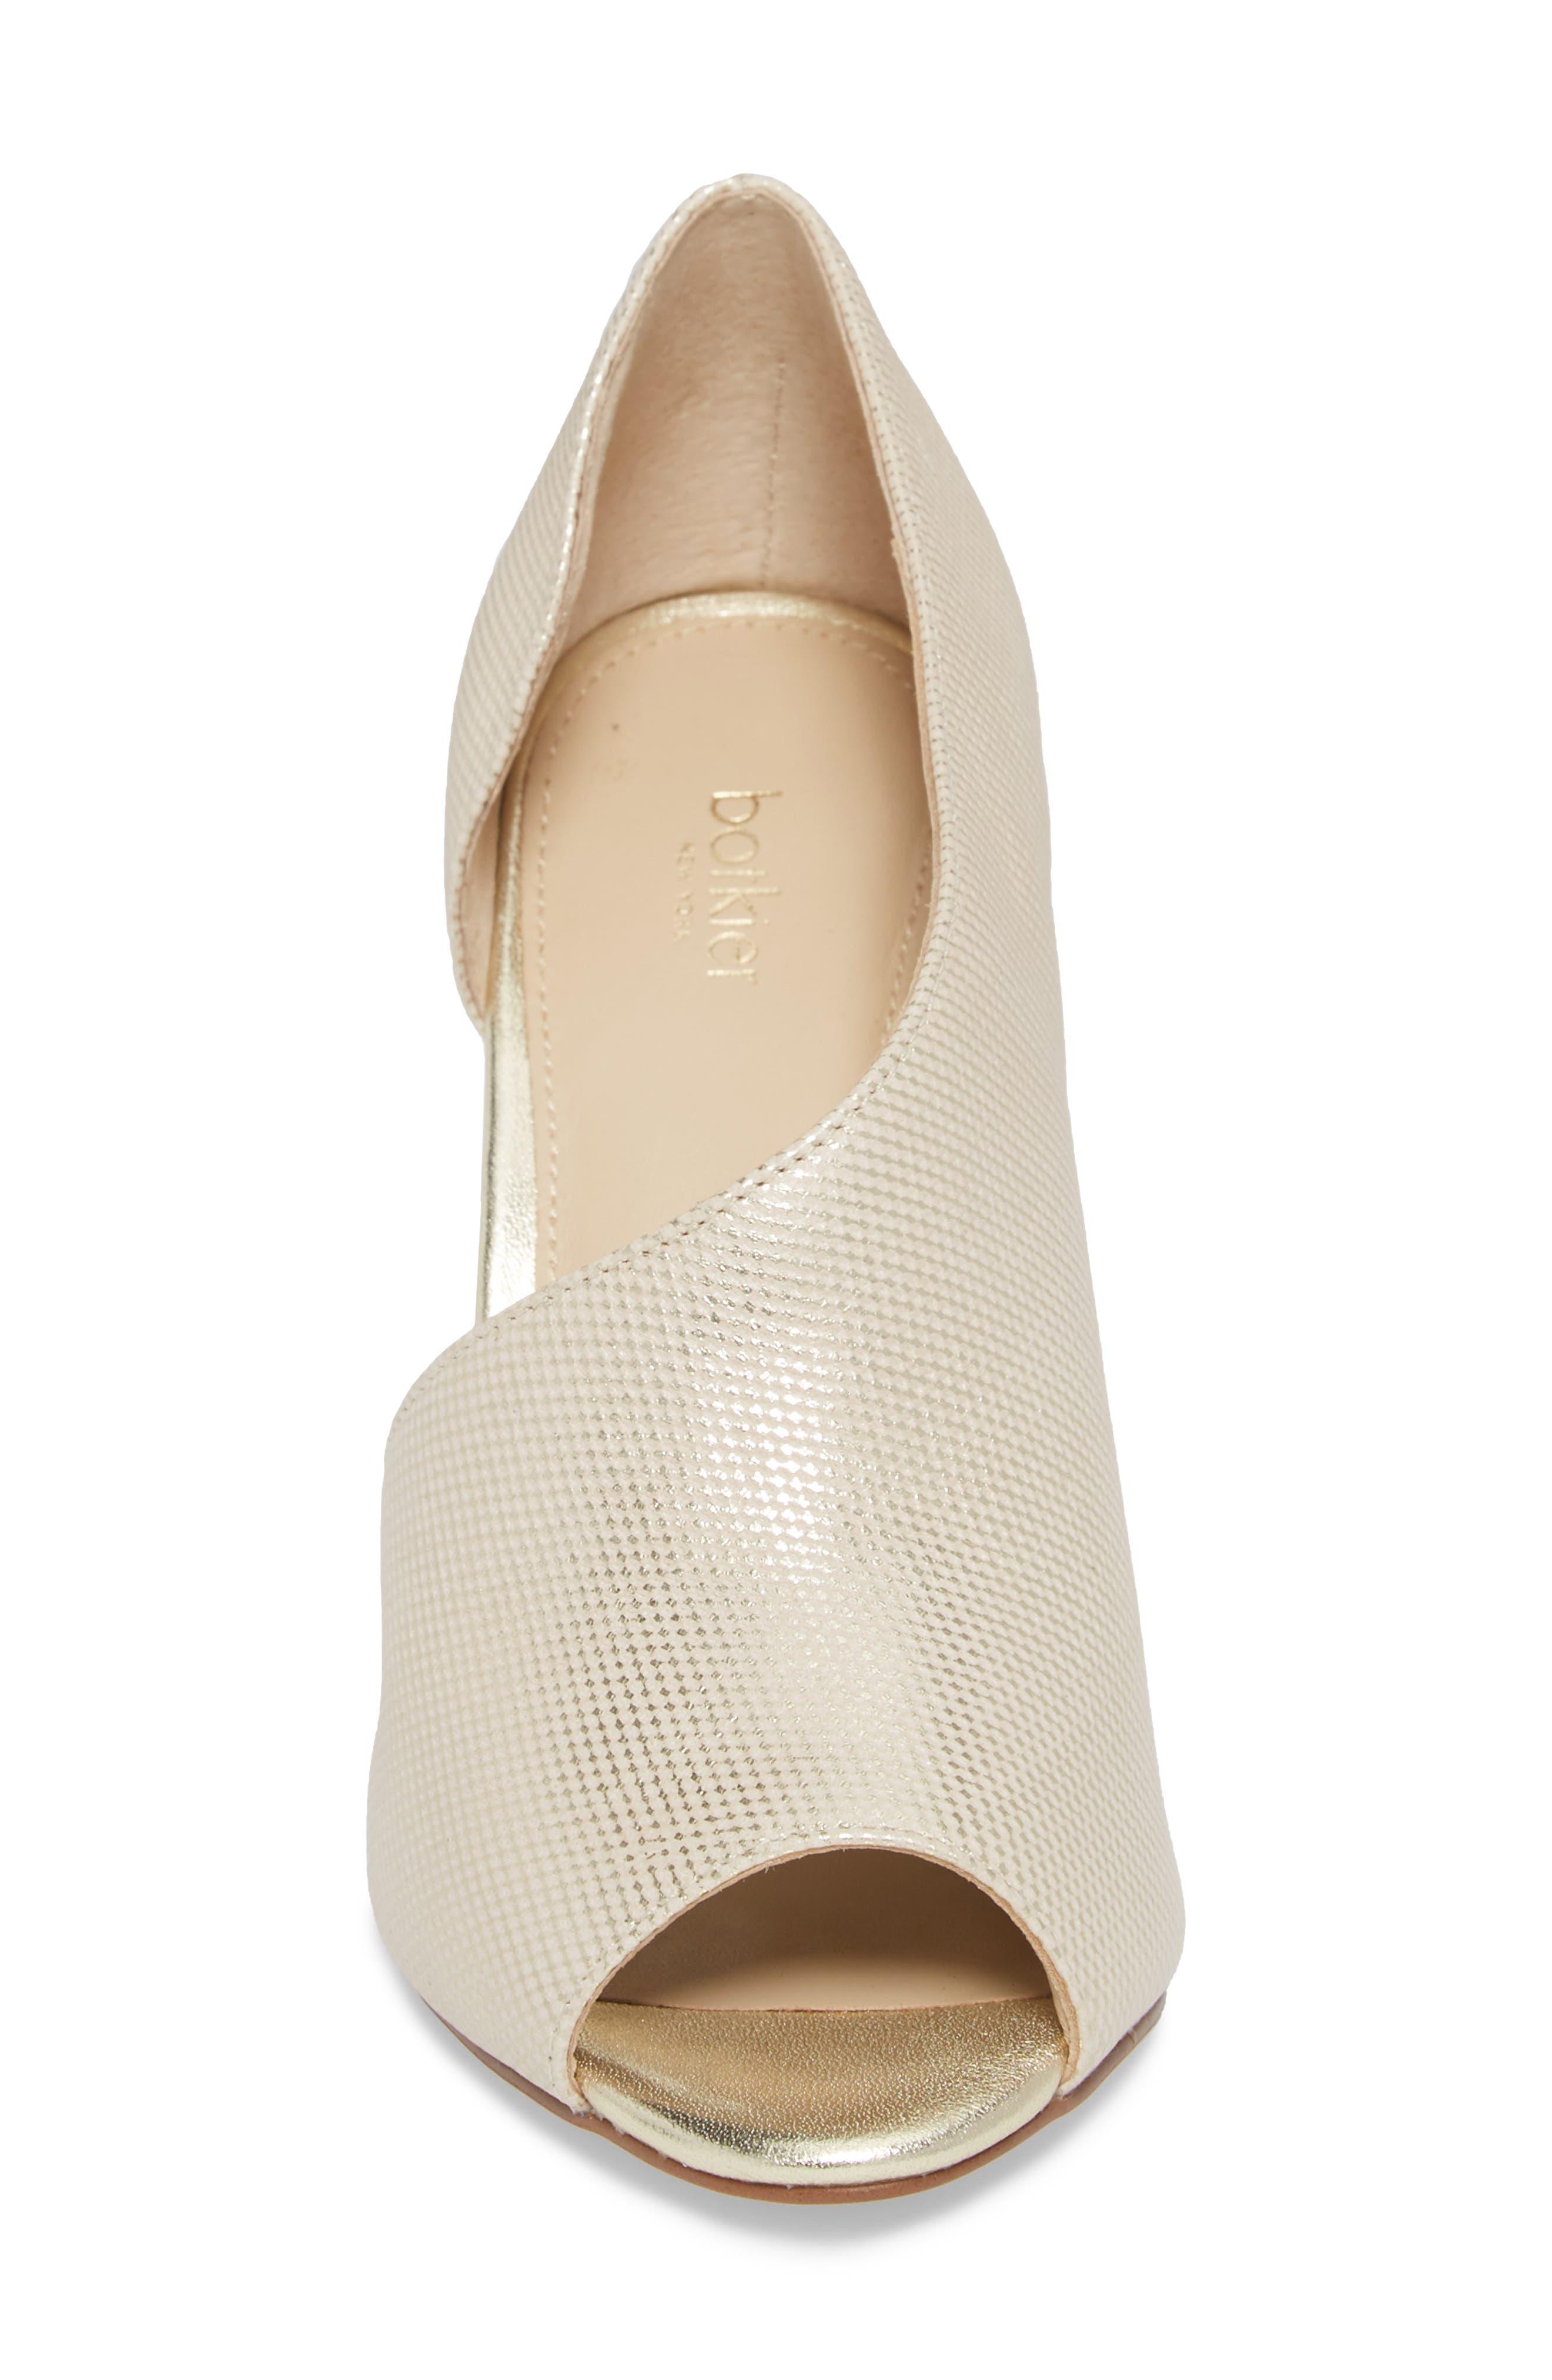 Adelia Asymmetrical Sandal,                             Alternate thumbnail 4, color,                             Gold Shimmer Fabric